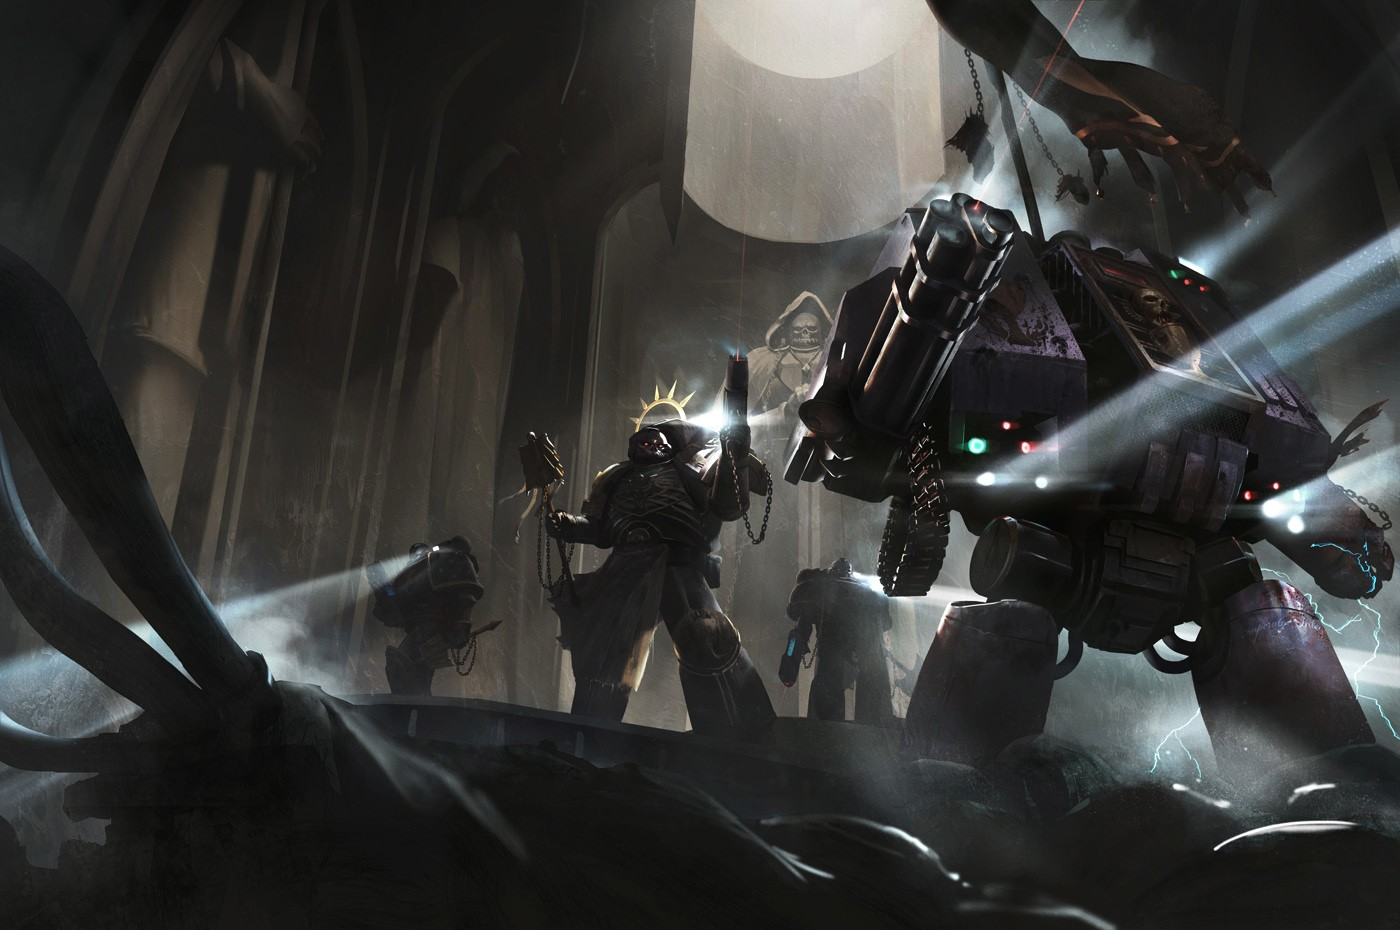 [W40K] Collection d'images : Warhammer 40K divers et inclassables - Page 2 Black_12